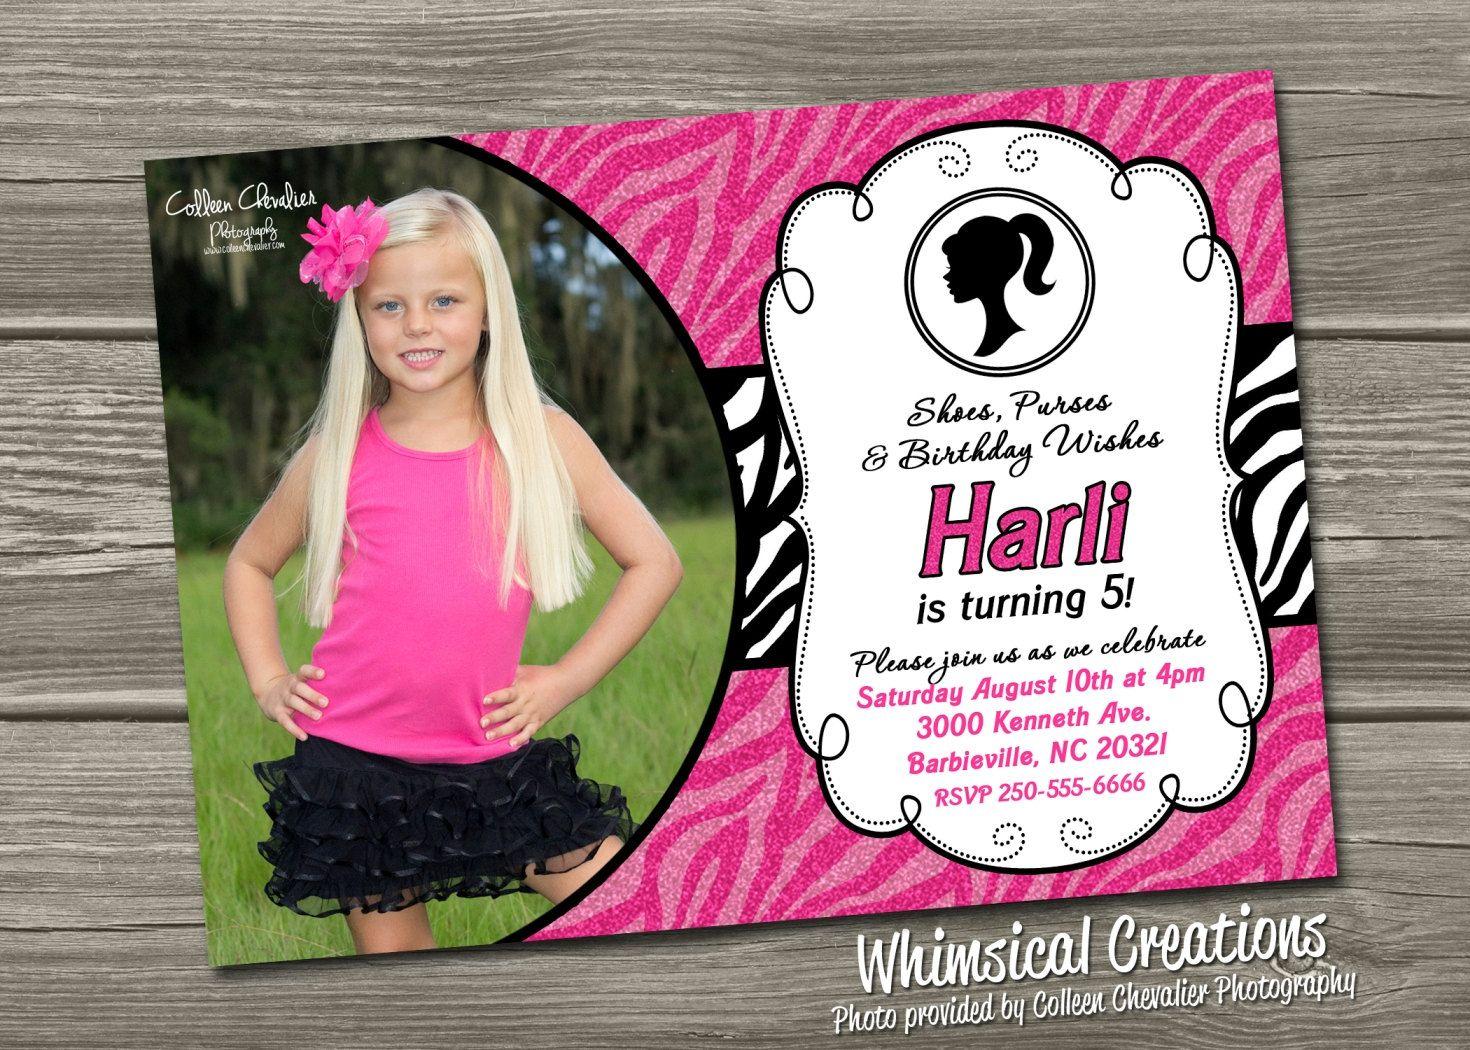 How To Create Barbie Birthday Invitations Designs Alluring Layout Egreetingecards Com Barbie Birthday Invitations Barbie Invitations Barbie Birthday